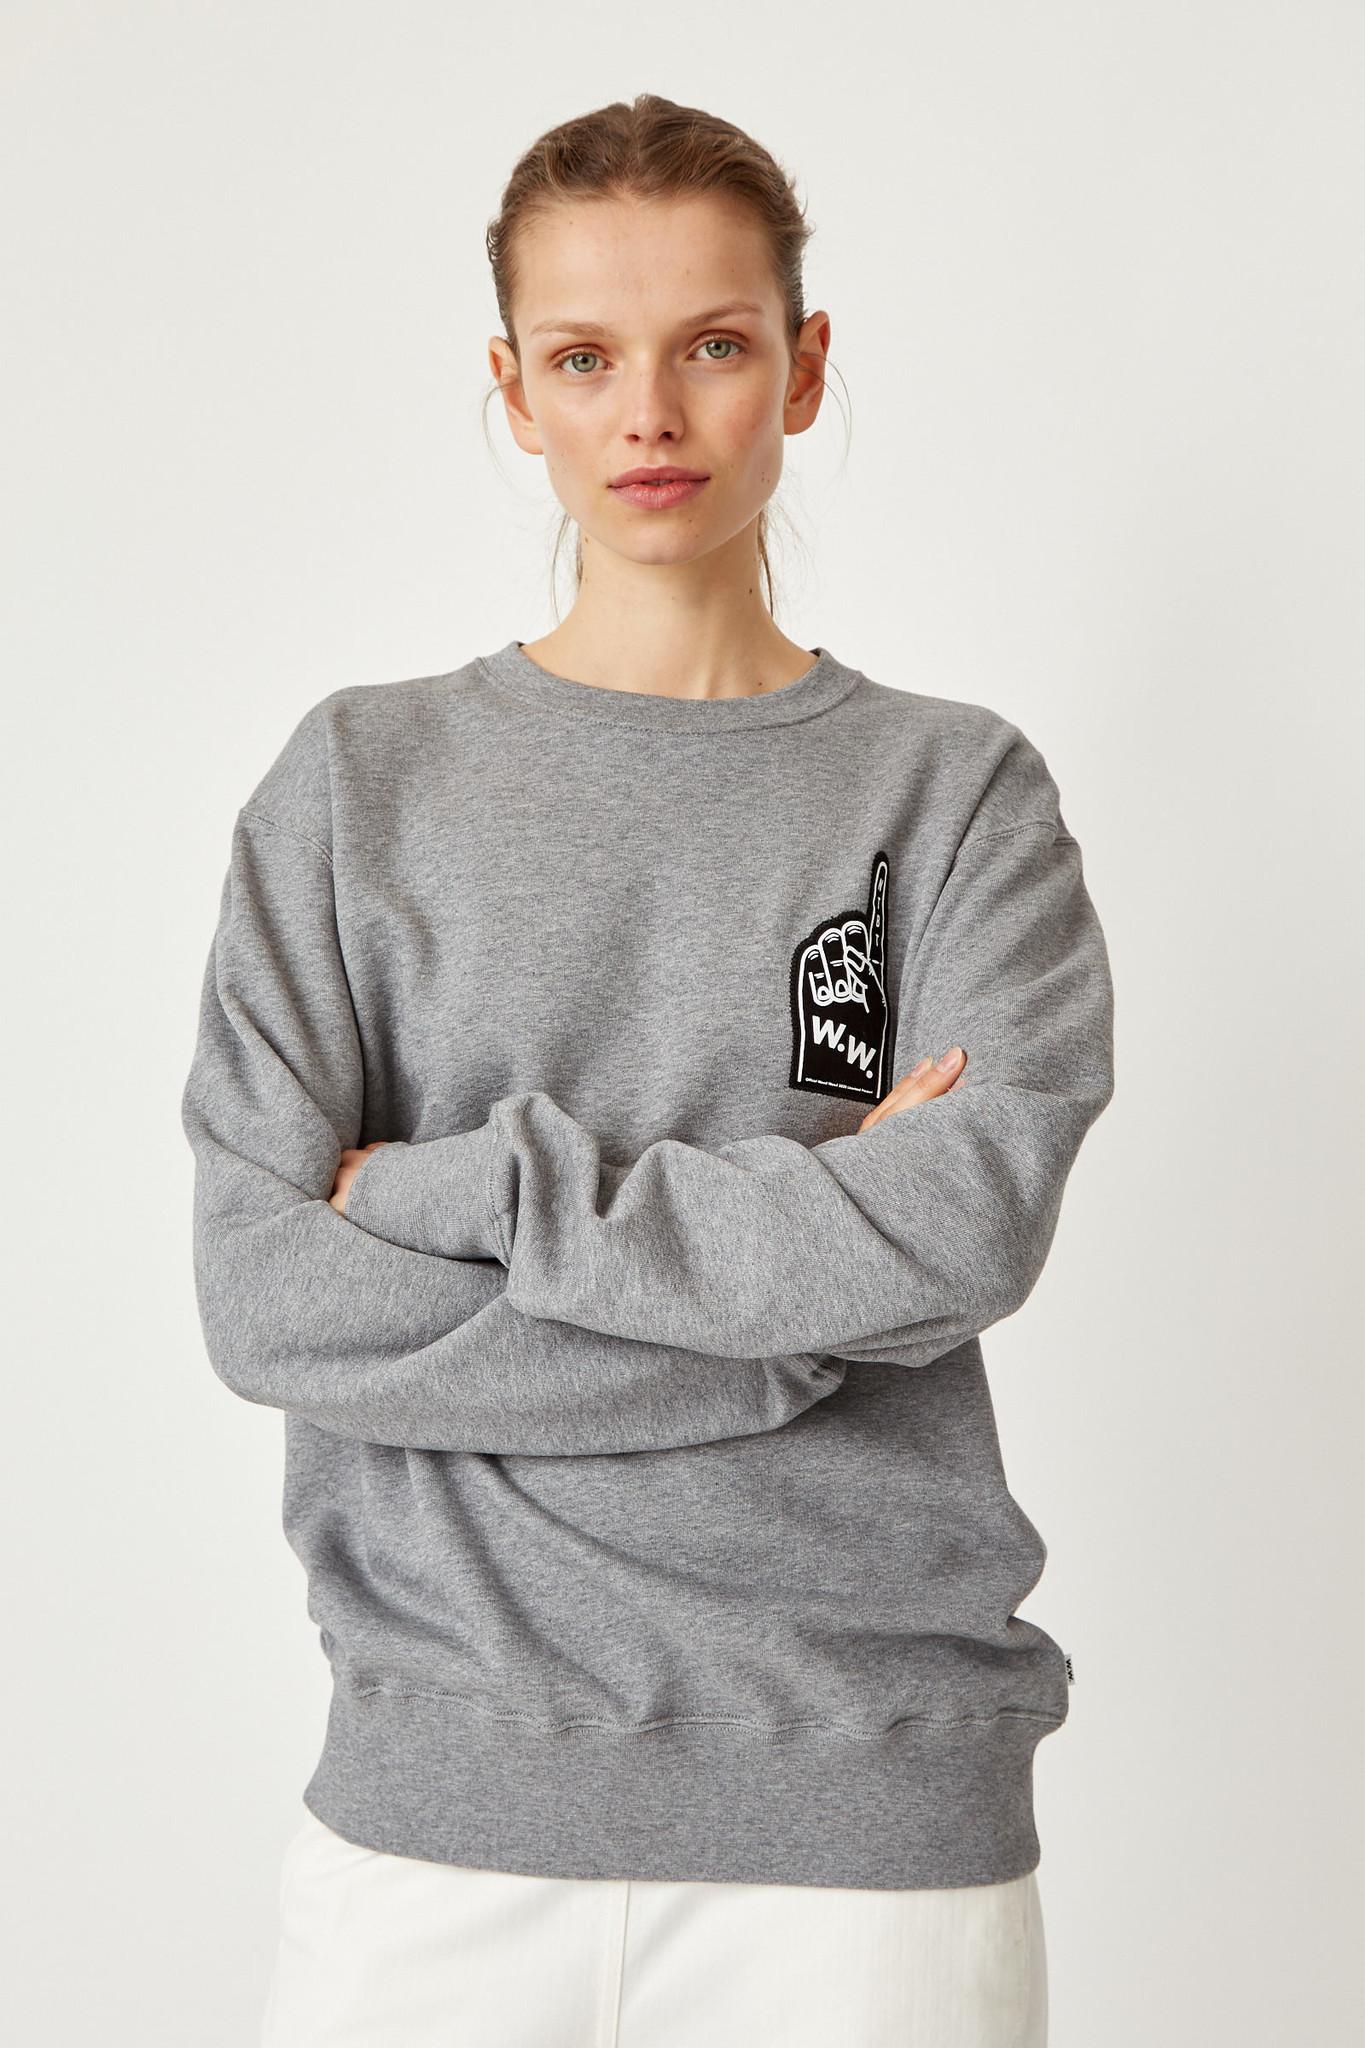 Hugh Sweatshirt Grey Melange Unisex-2